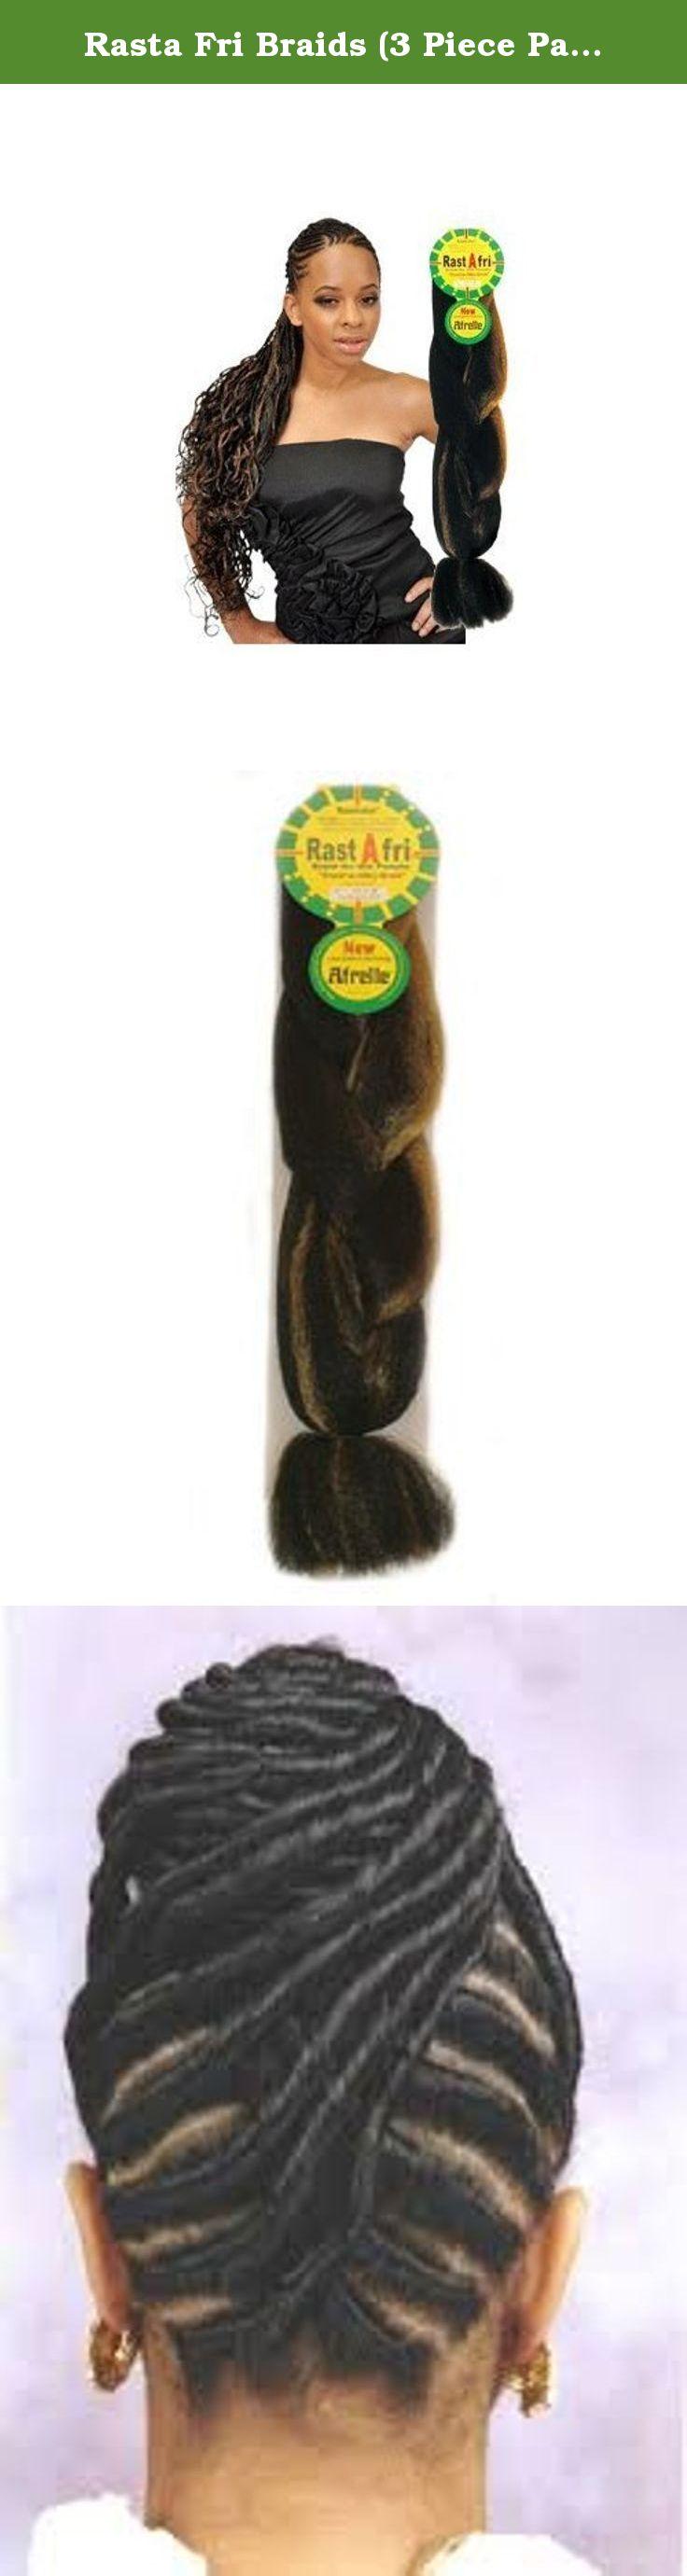 Rasta Fri Braids 3 Piece Pack For 10 Off Black 1b Rasta Fri Braid Afrelle Is A Softer Safer Silkier Easier M Natural Braids Wig Accessories Hair Styles